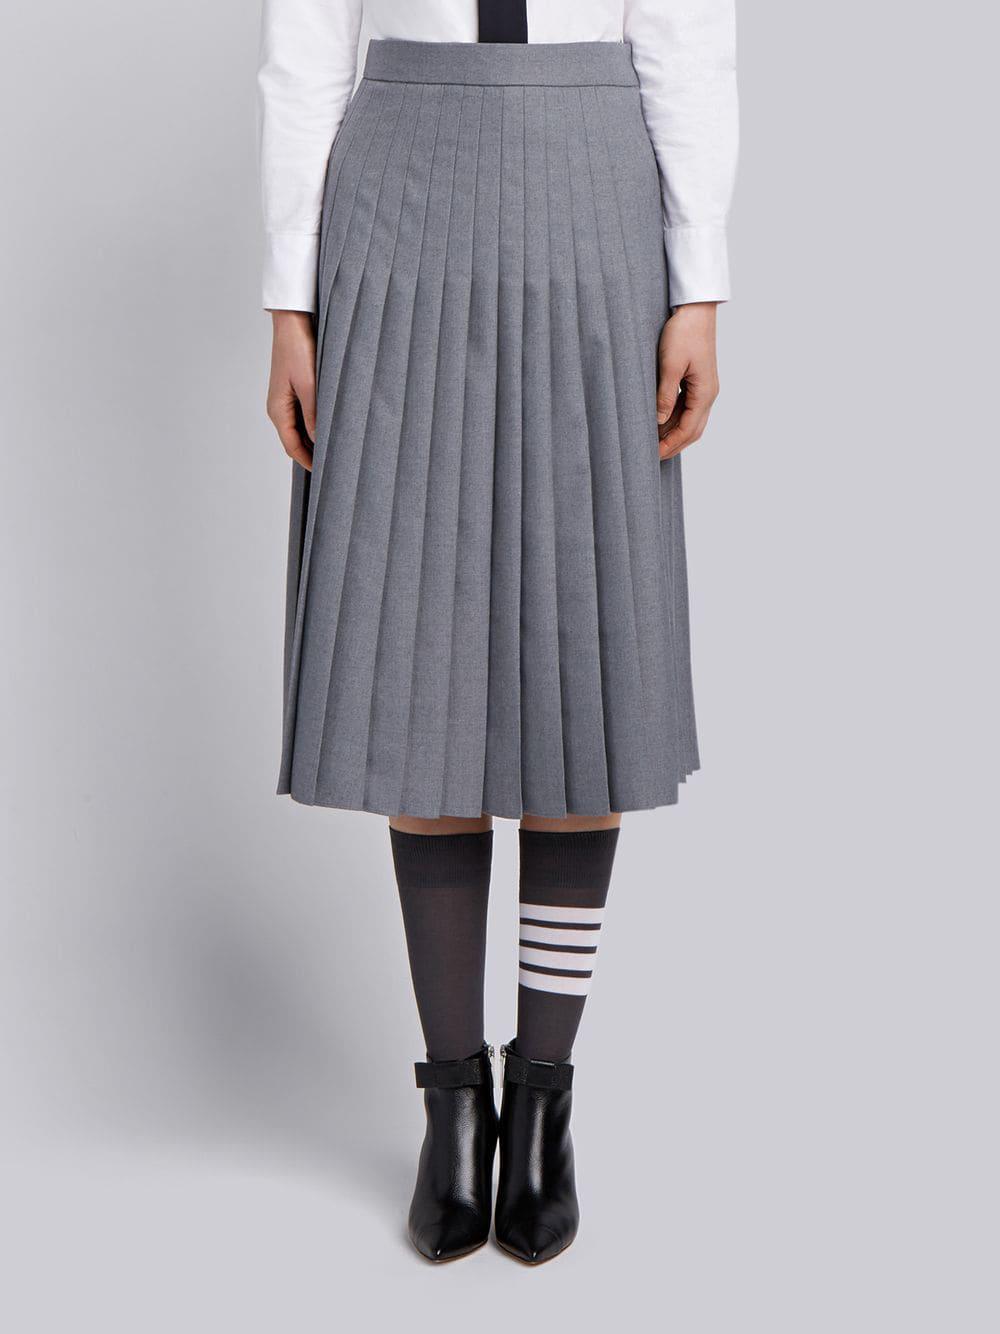 64dd15a68 Long Grey School Skirts - raveitsafe